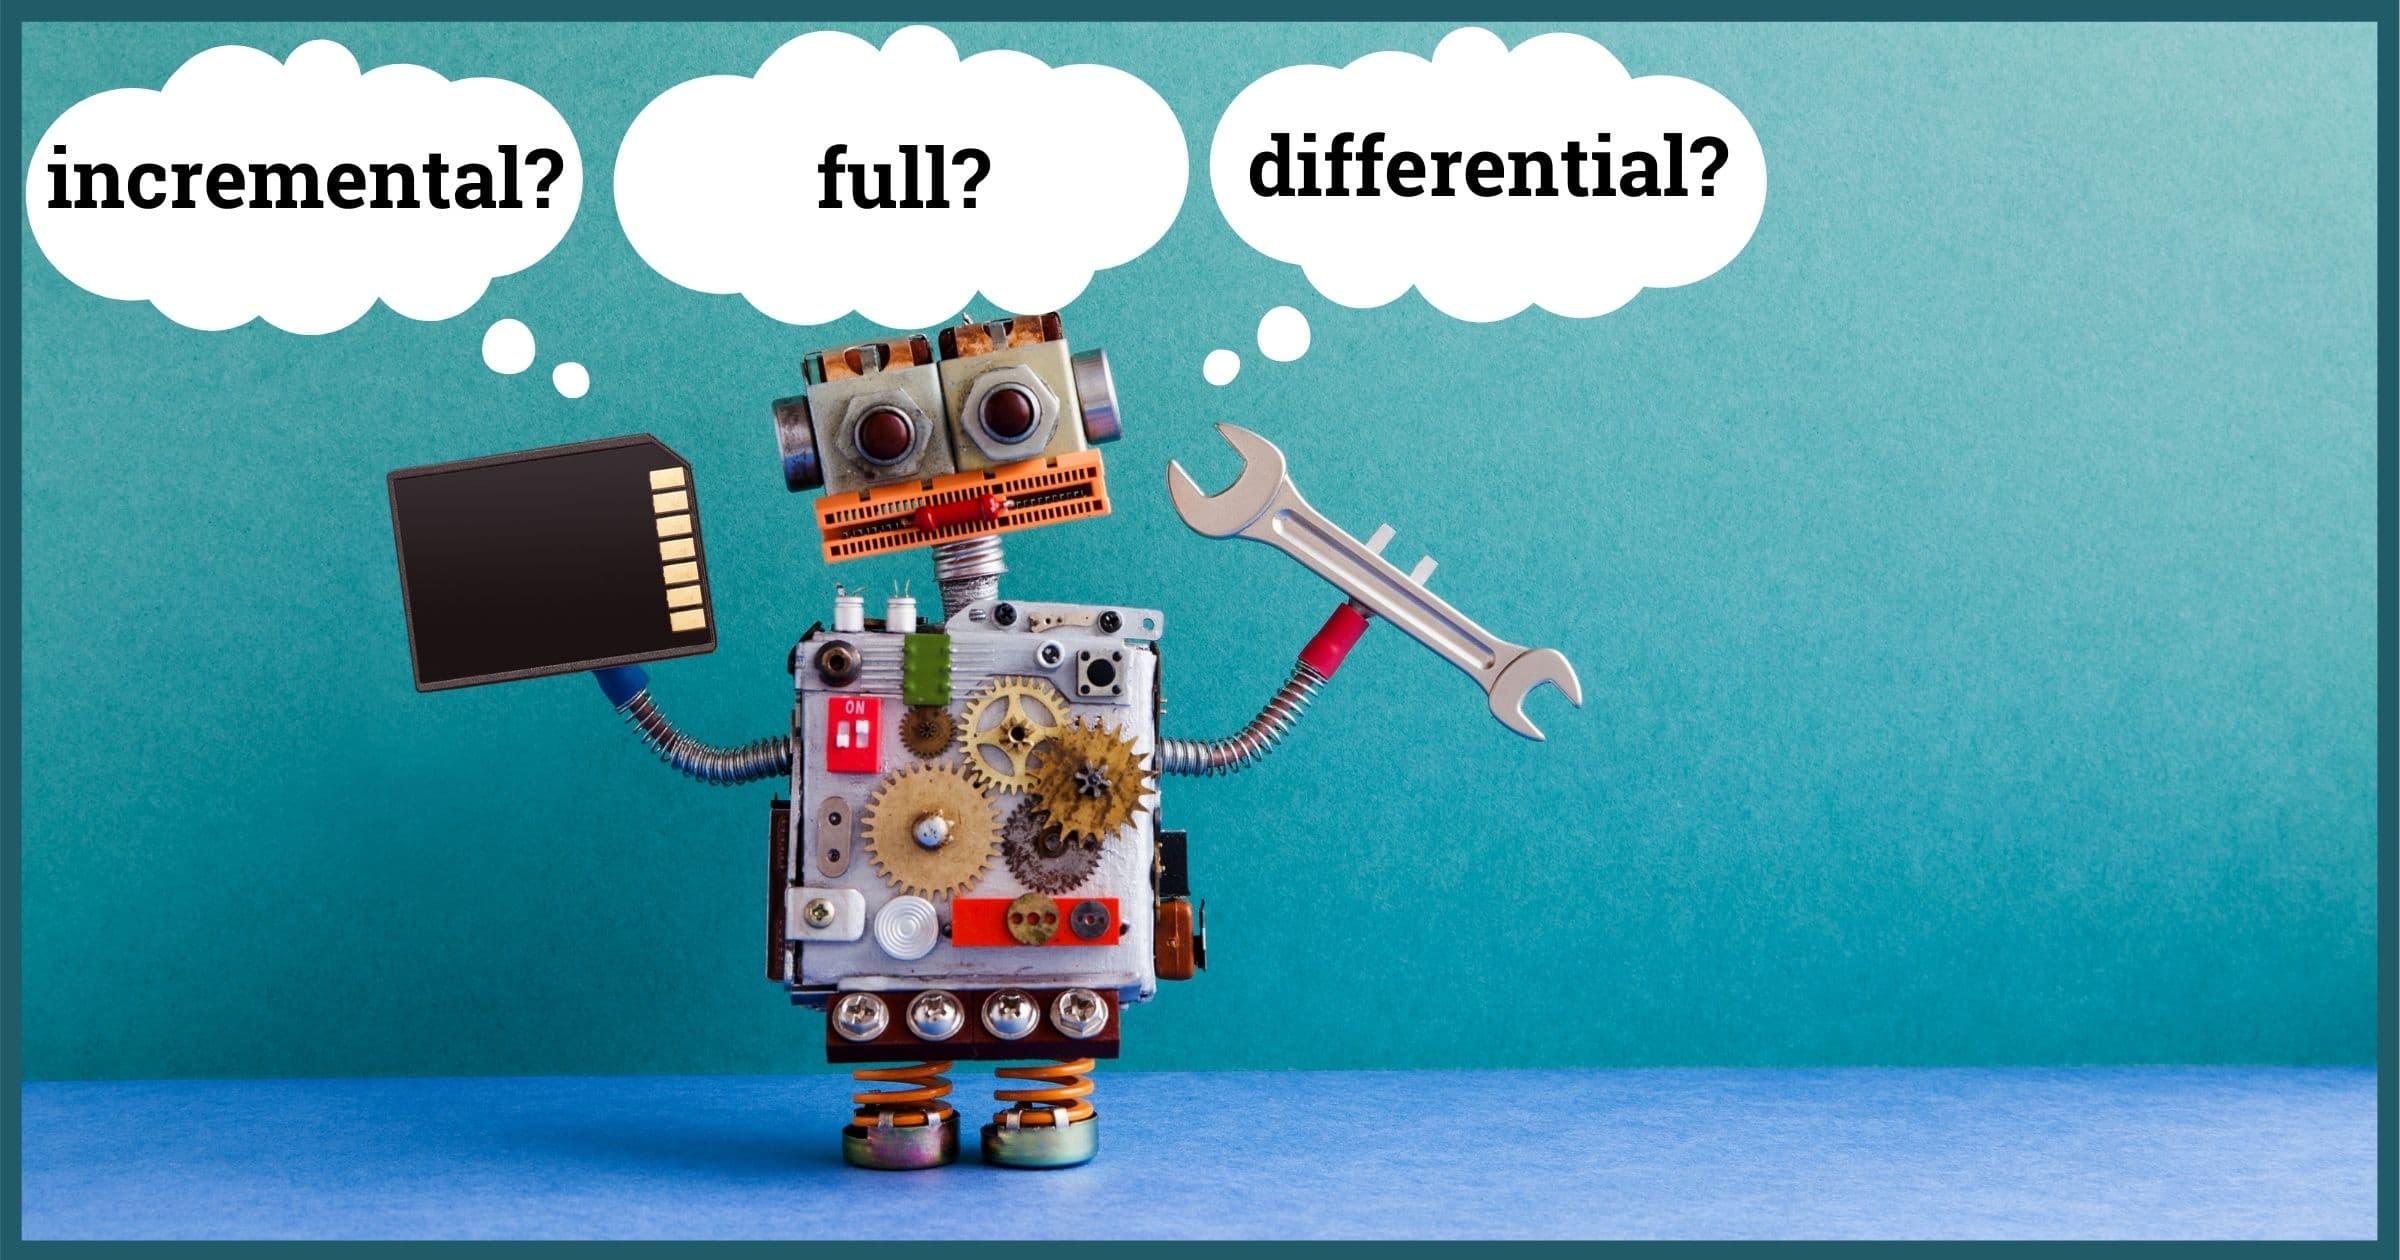 Incremental? Full? Differential?